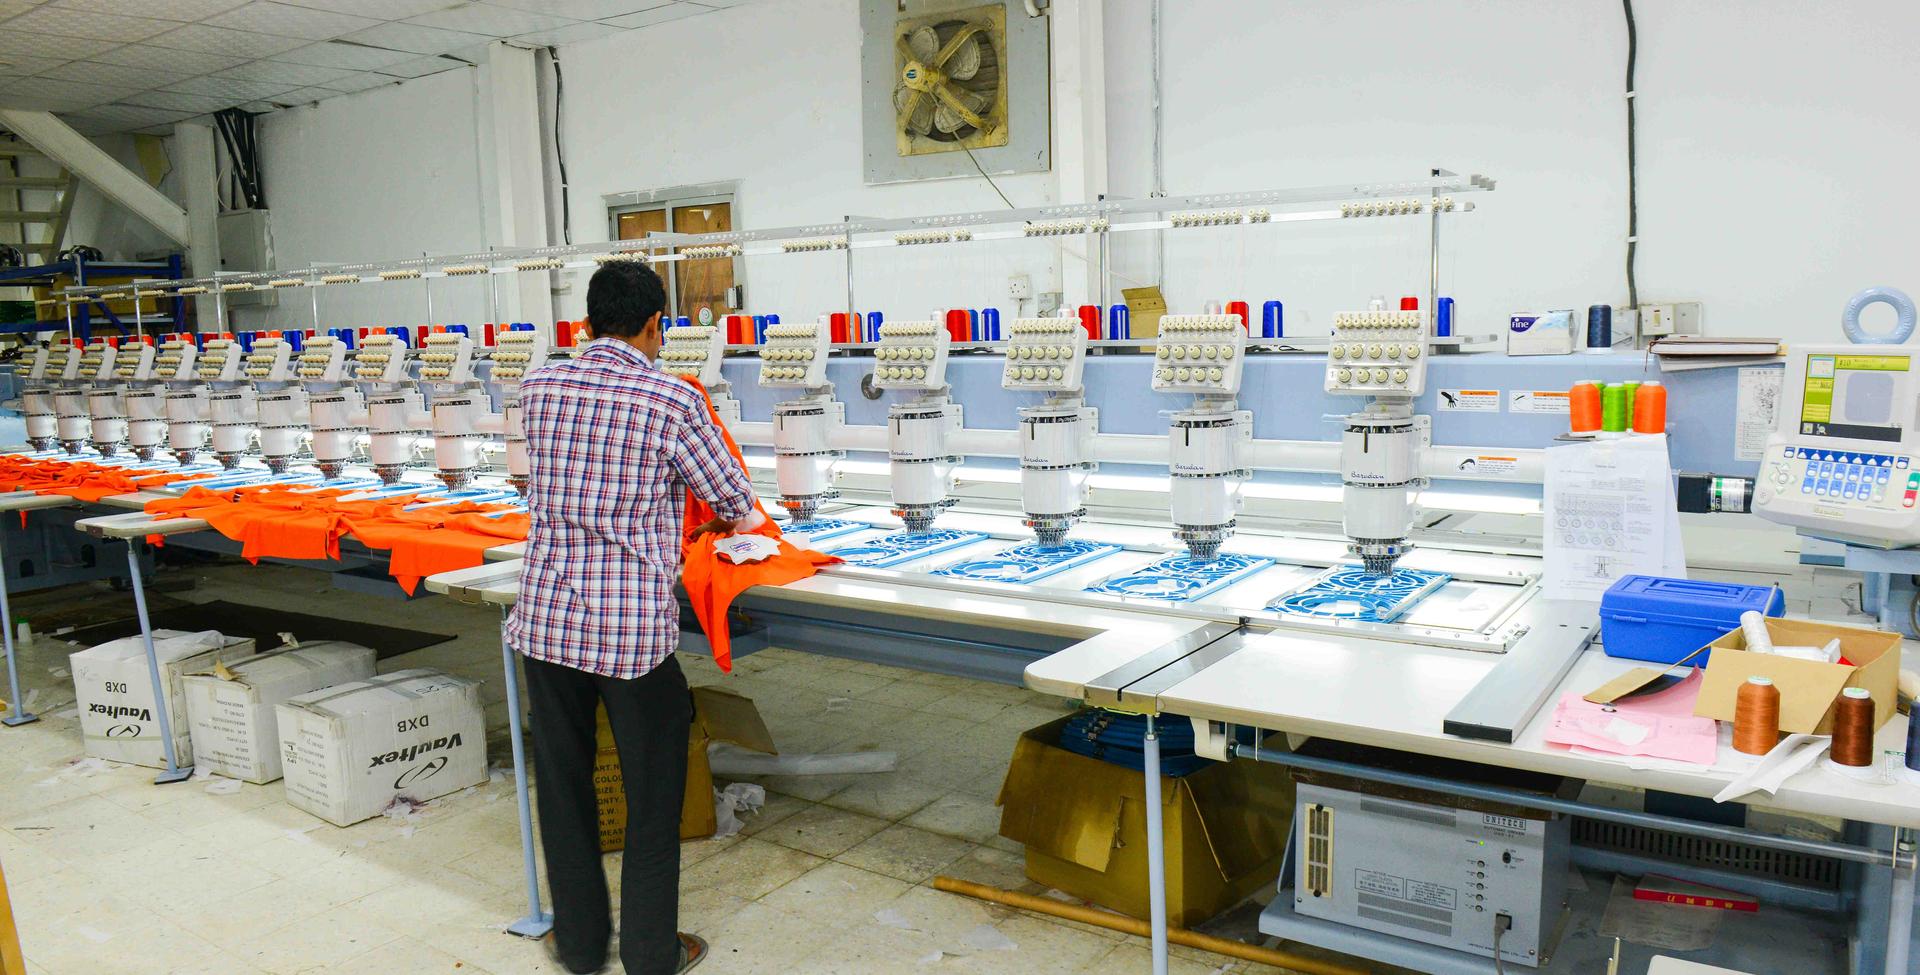 Al Jameela Garments Workshop - Embroidery Shops, Garments, Custom